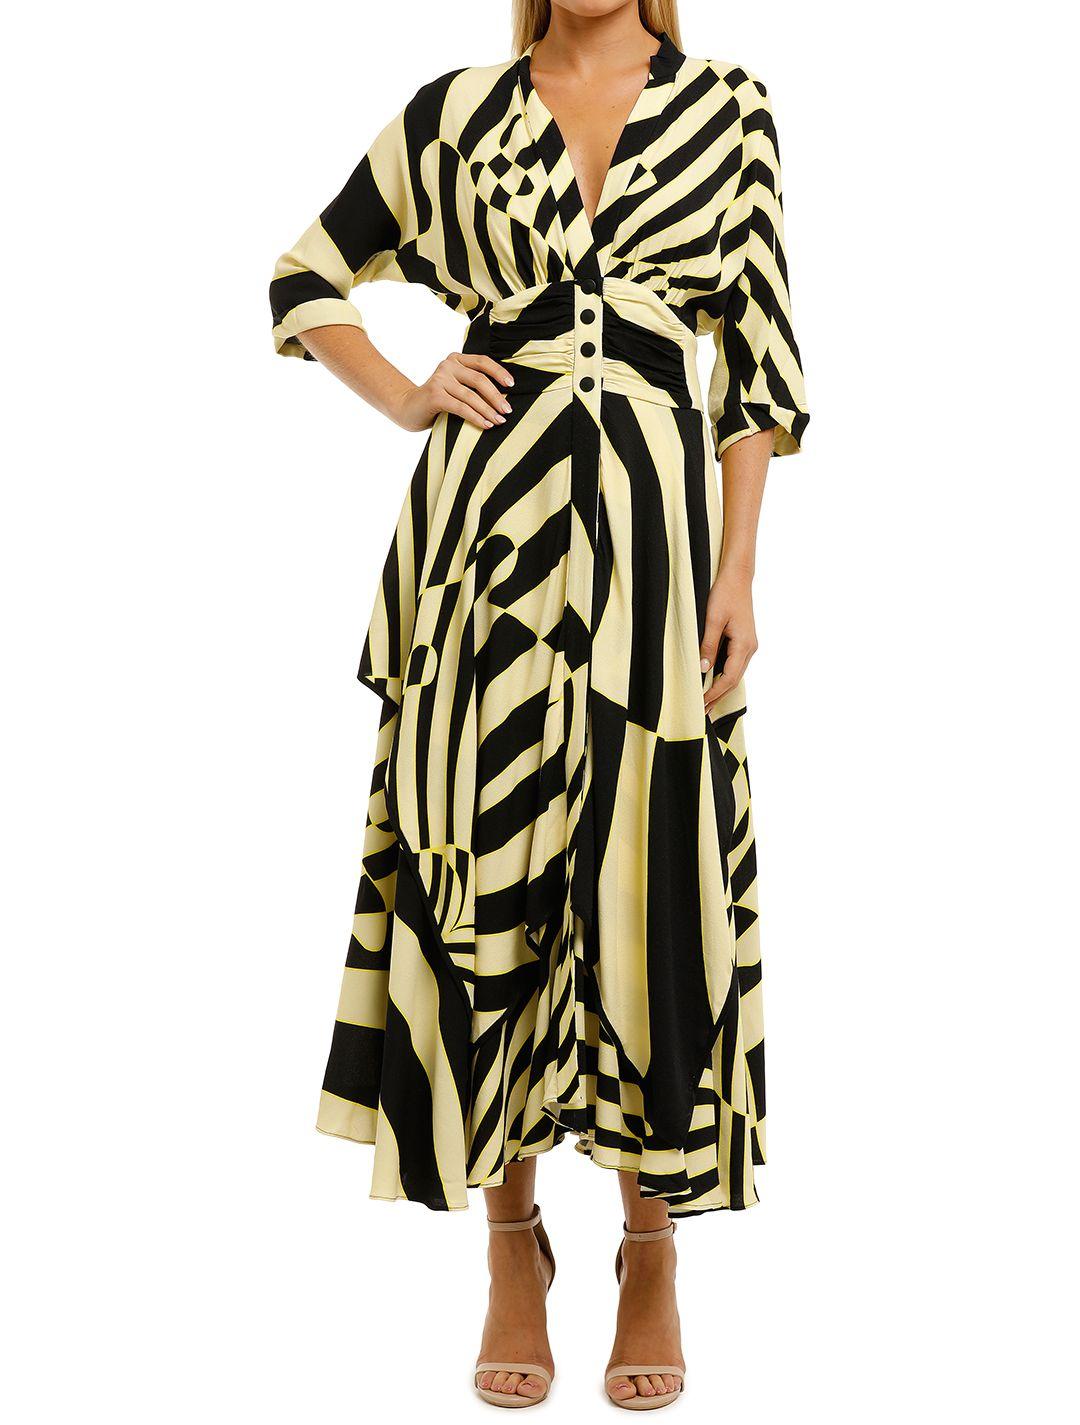 KITX-Stripes-Handkerchief-Shirt Dress-Zebra Print-Front